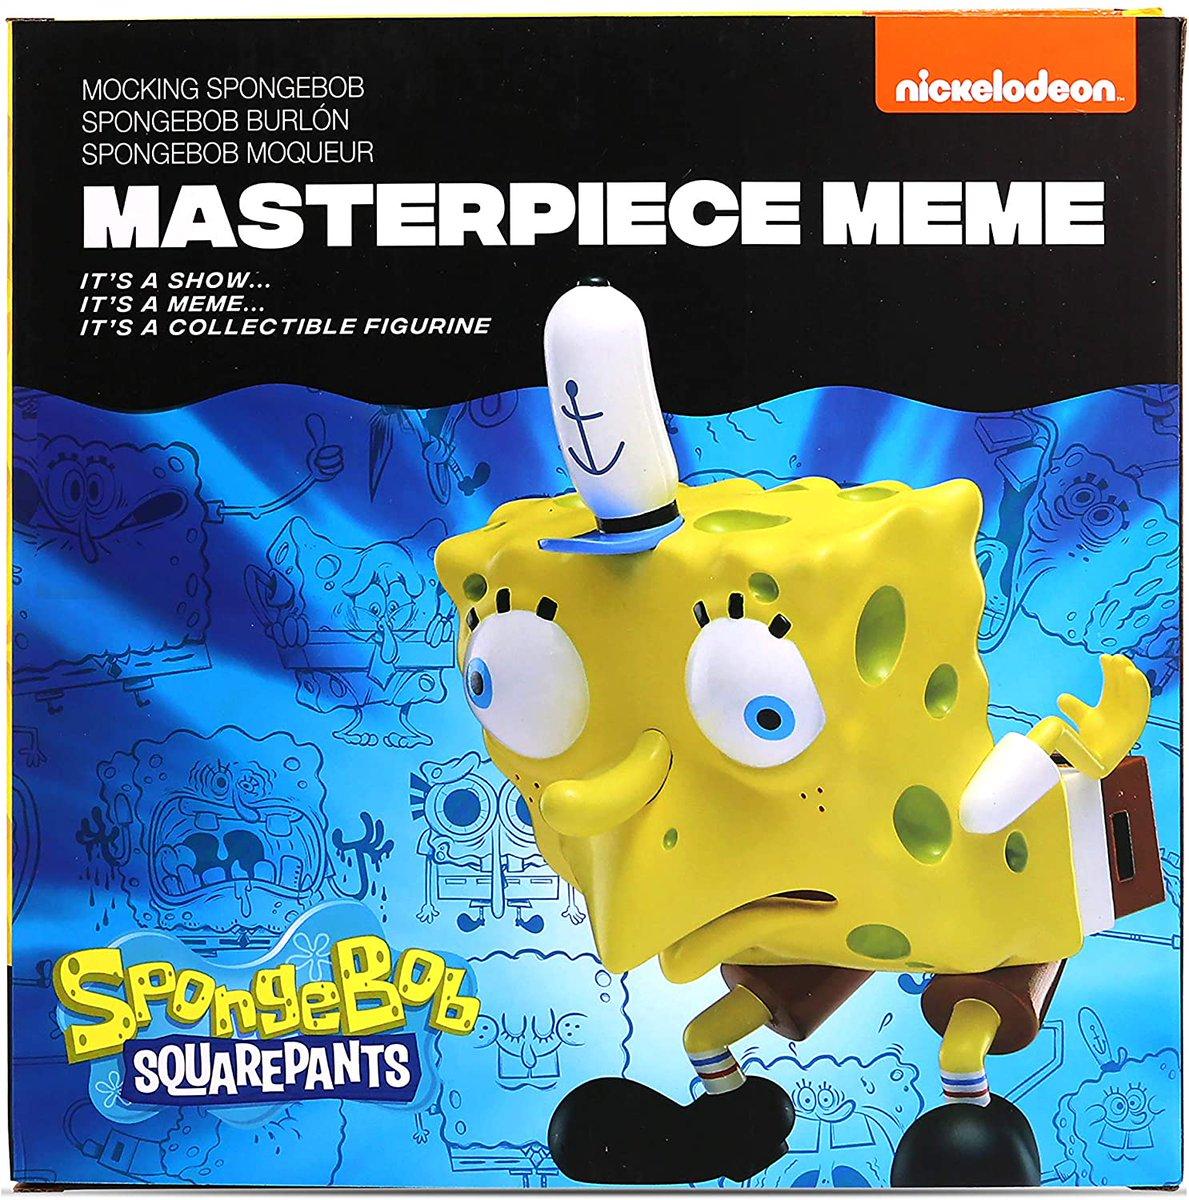 Mocking Spongebob Masterpiece Meme is $7.79 on Amazon 2